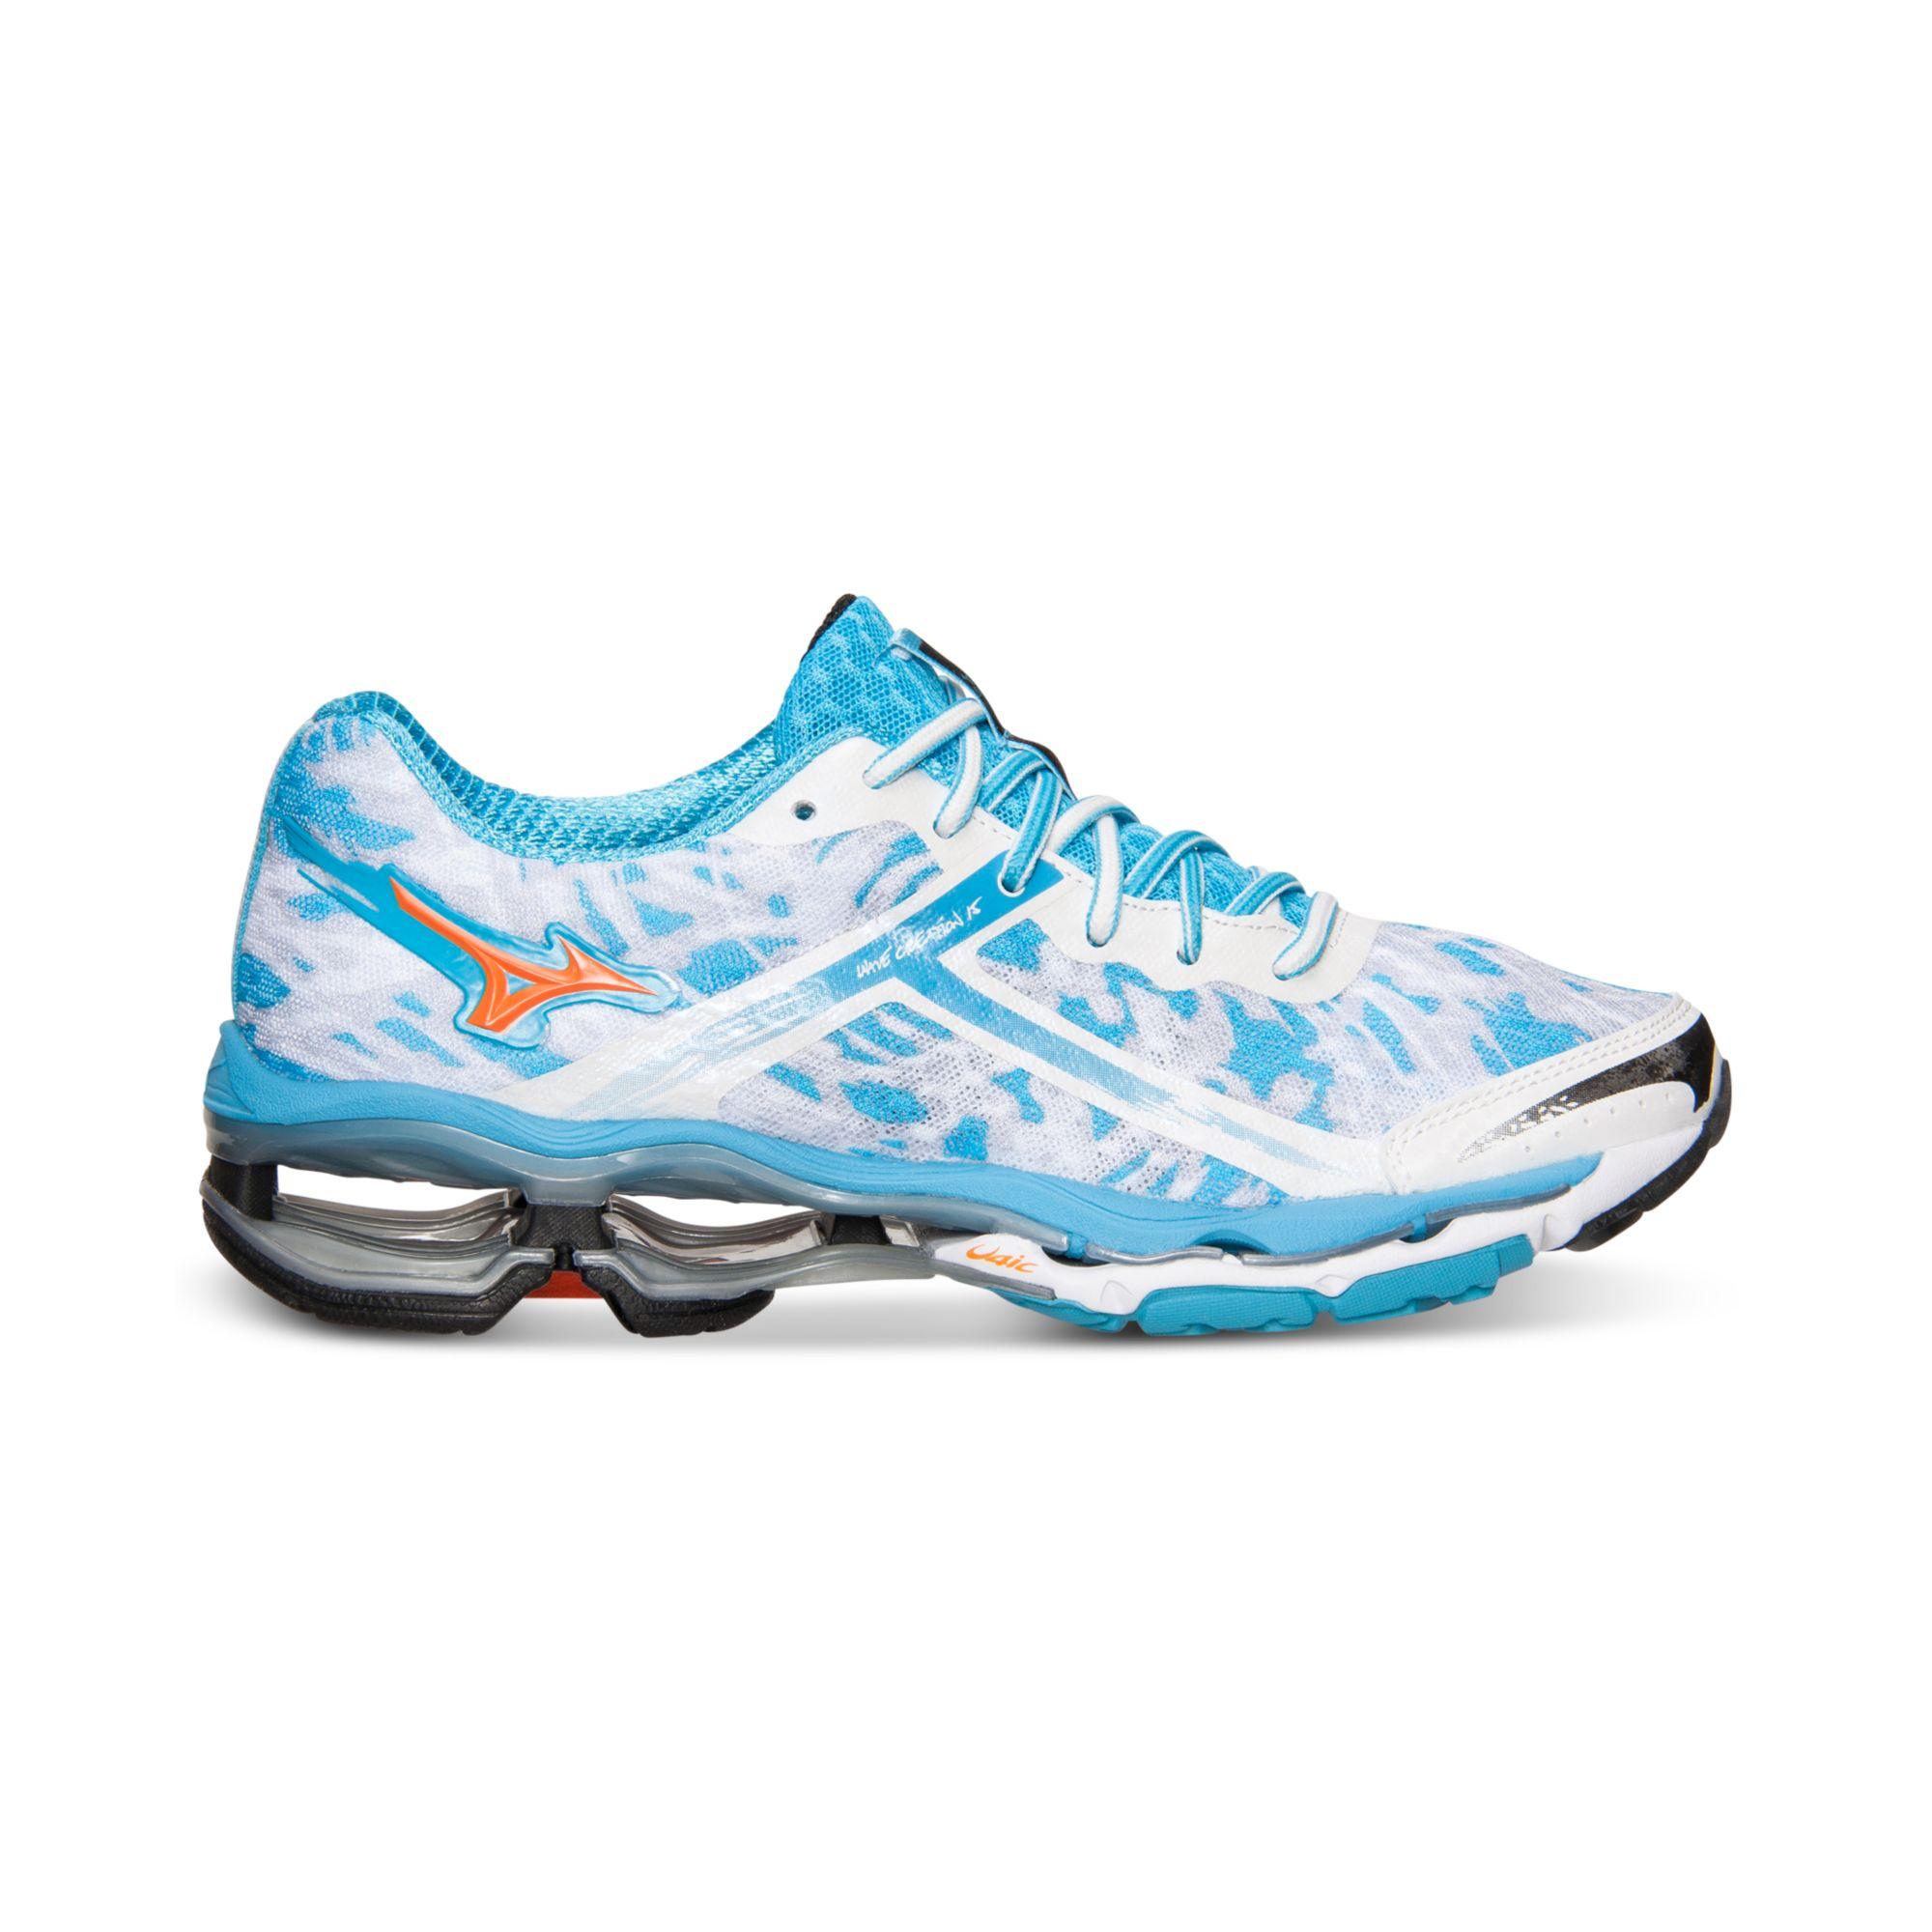 Womens Mizuno Running Shoes Pronation